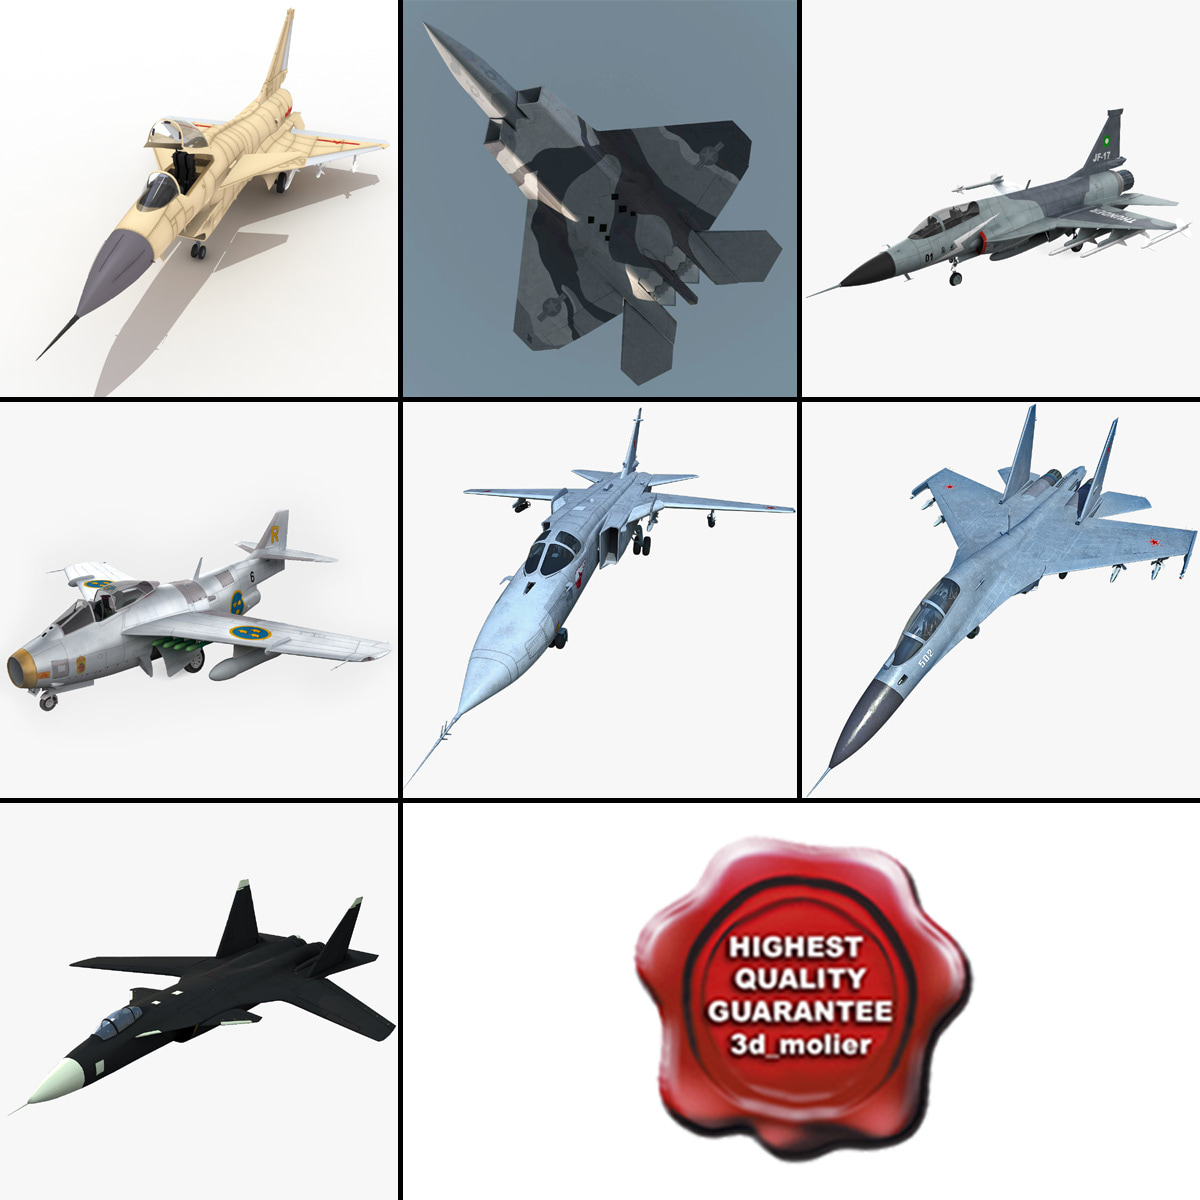 jet fighters 9 j 3d model